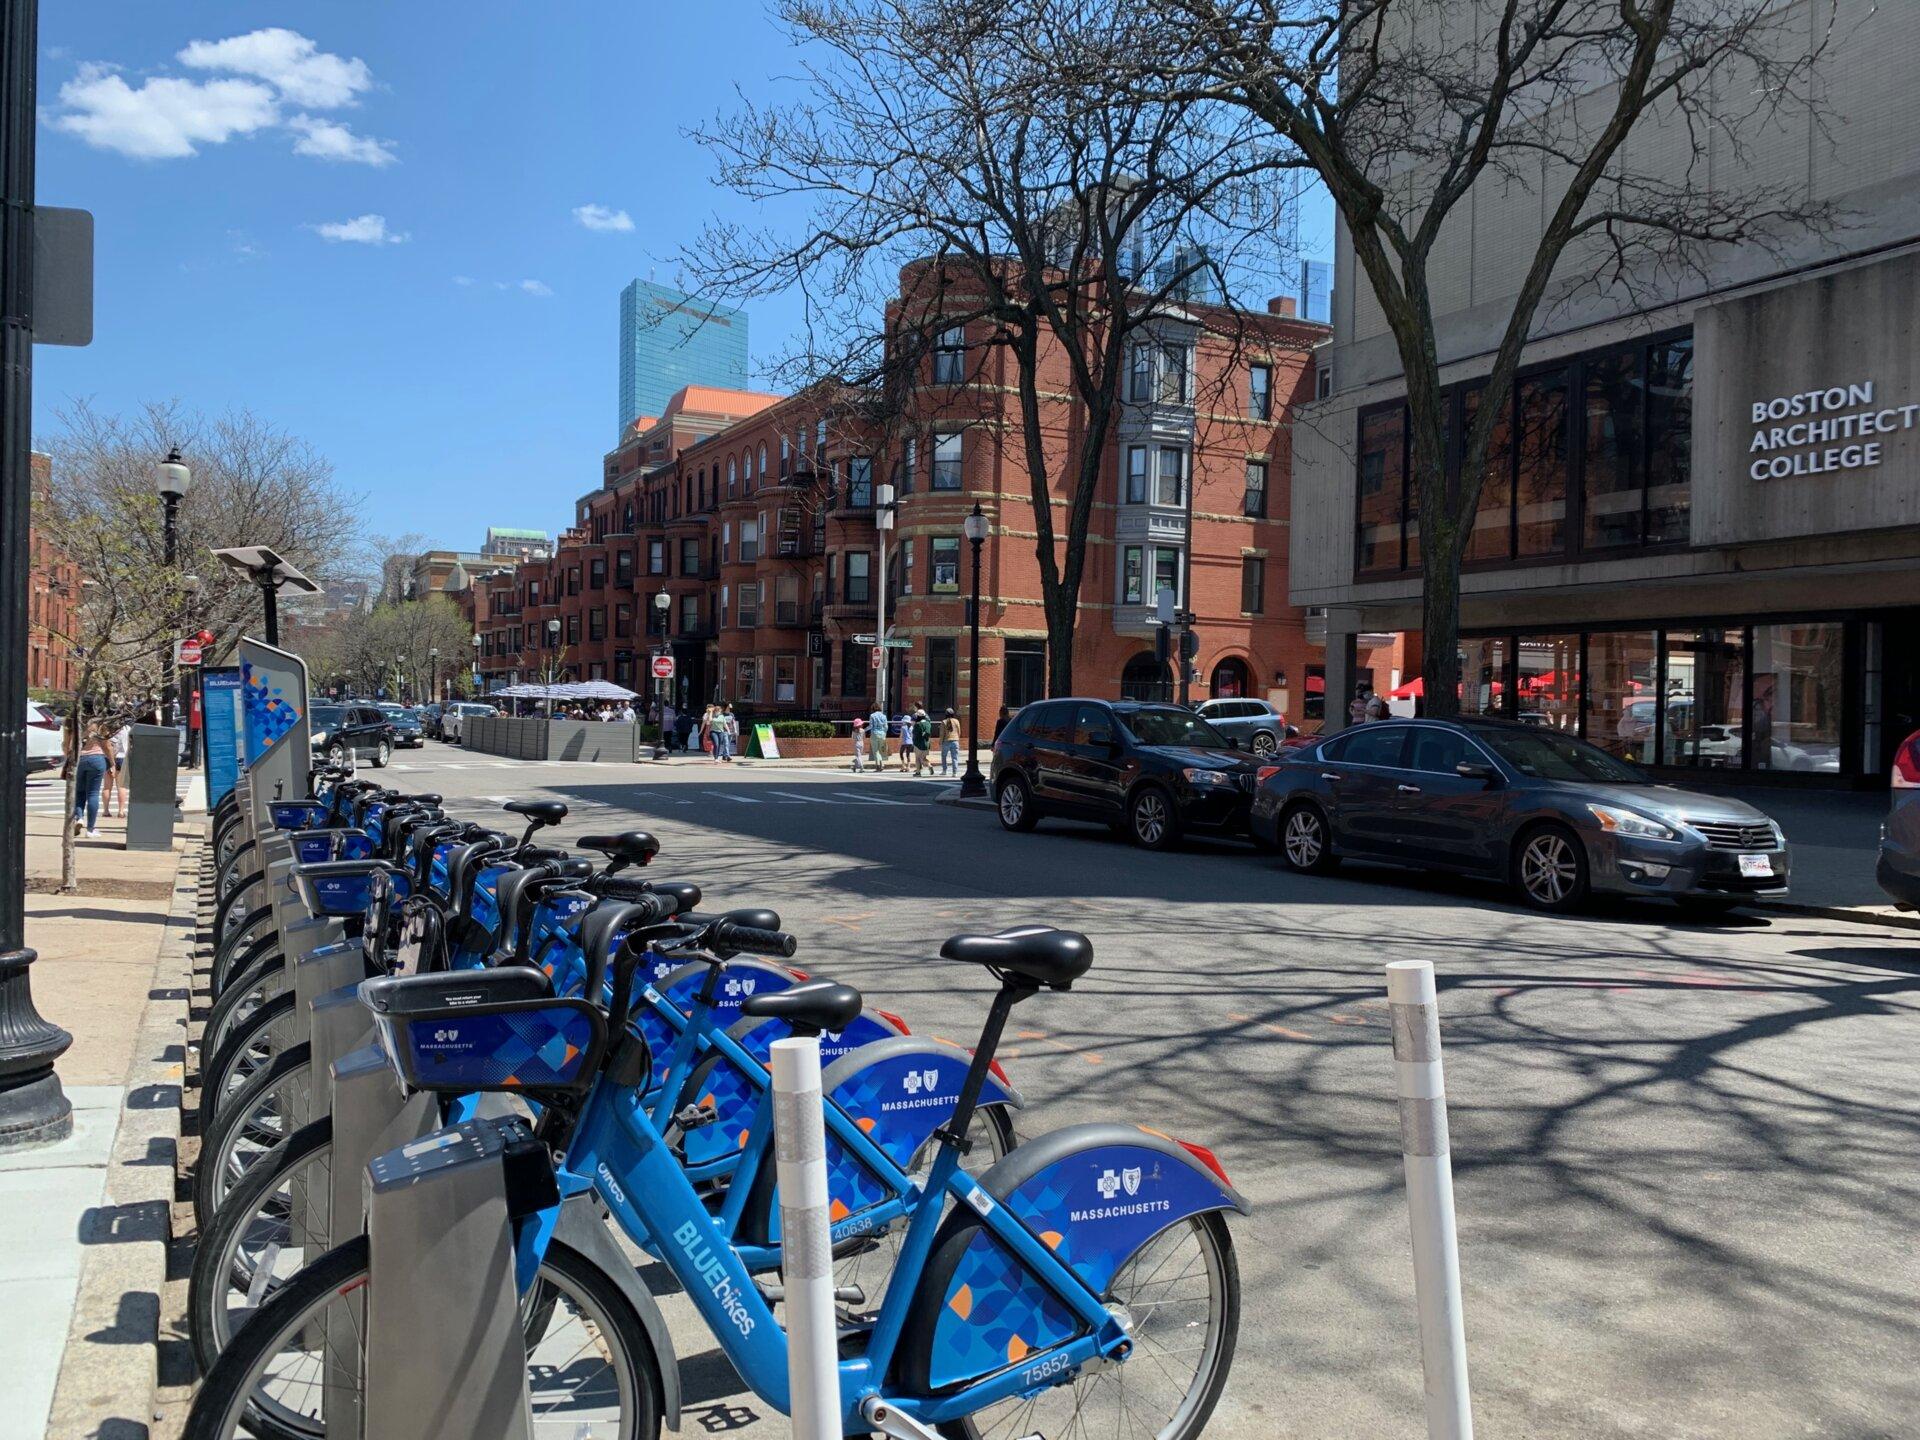 Bluebikes on Newbury Street